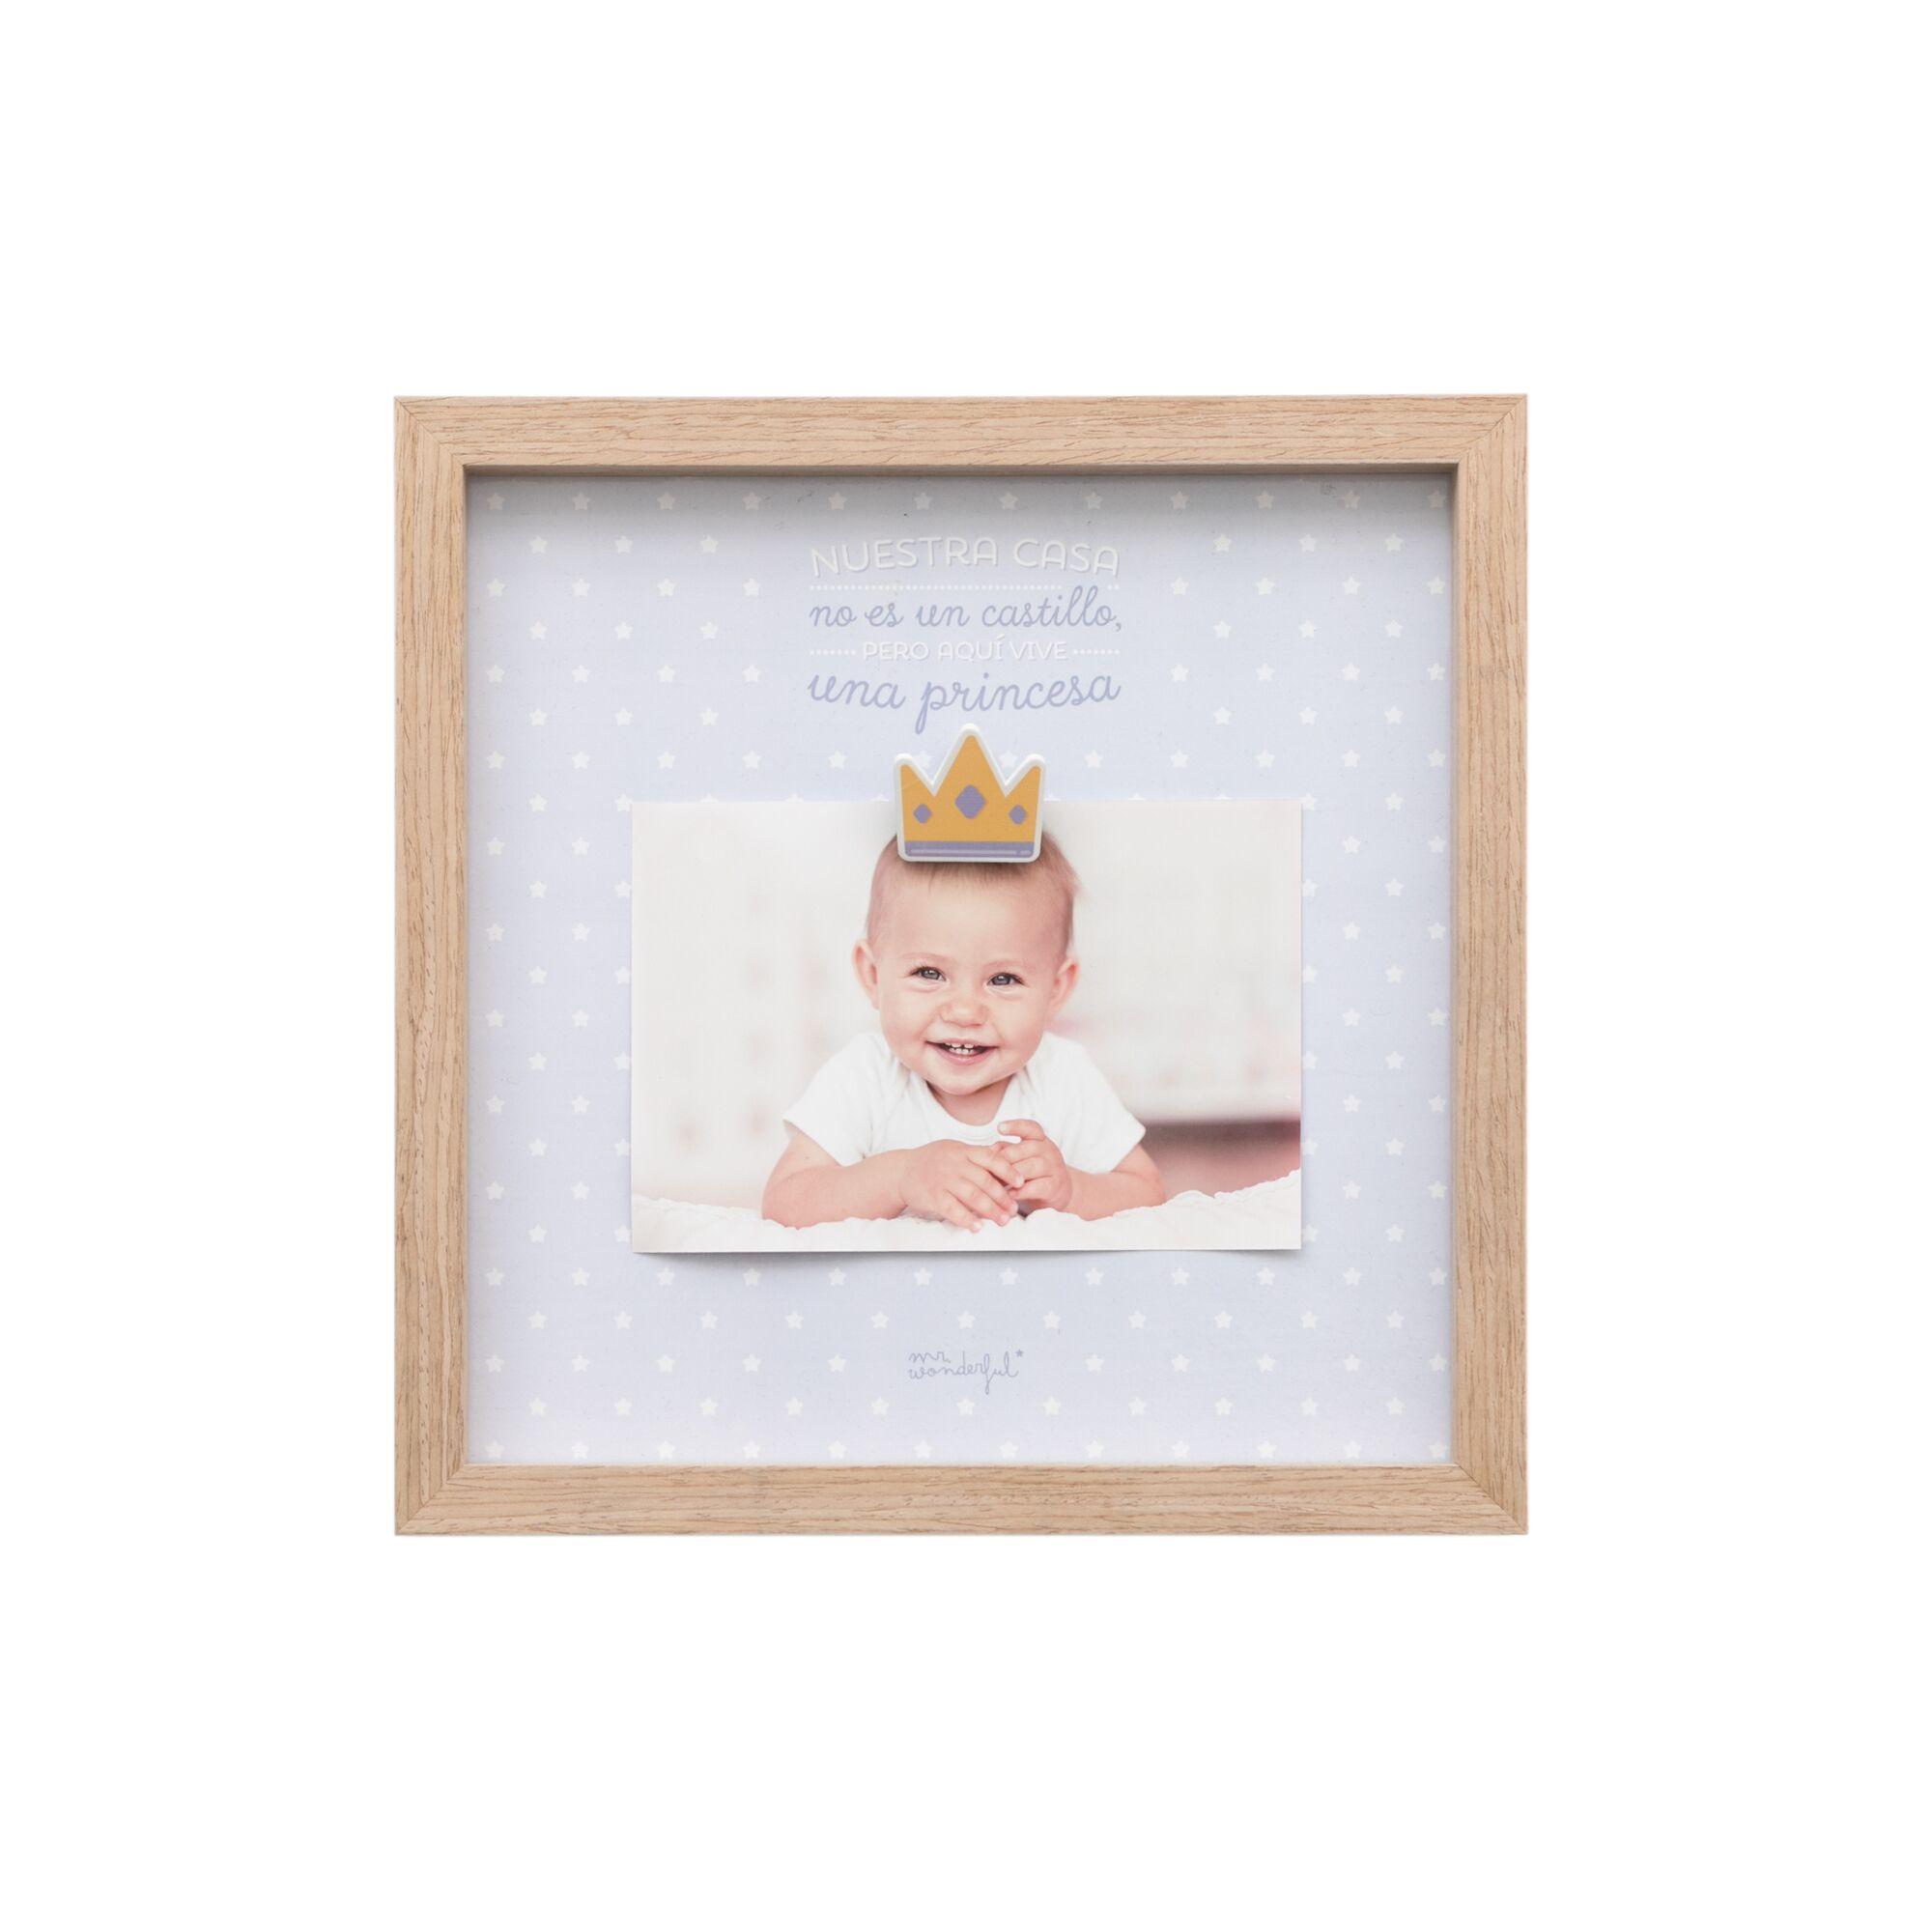 Marco-bebe-princesa